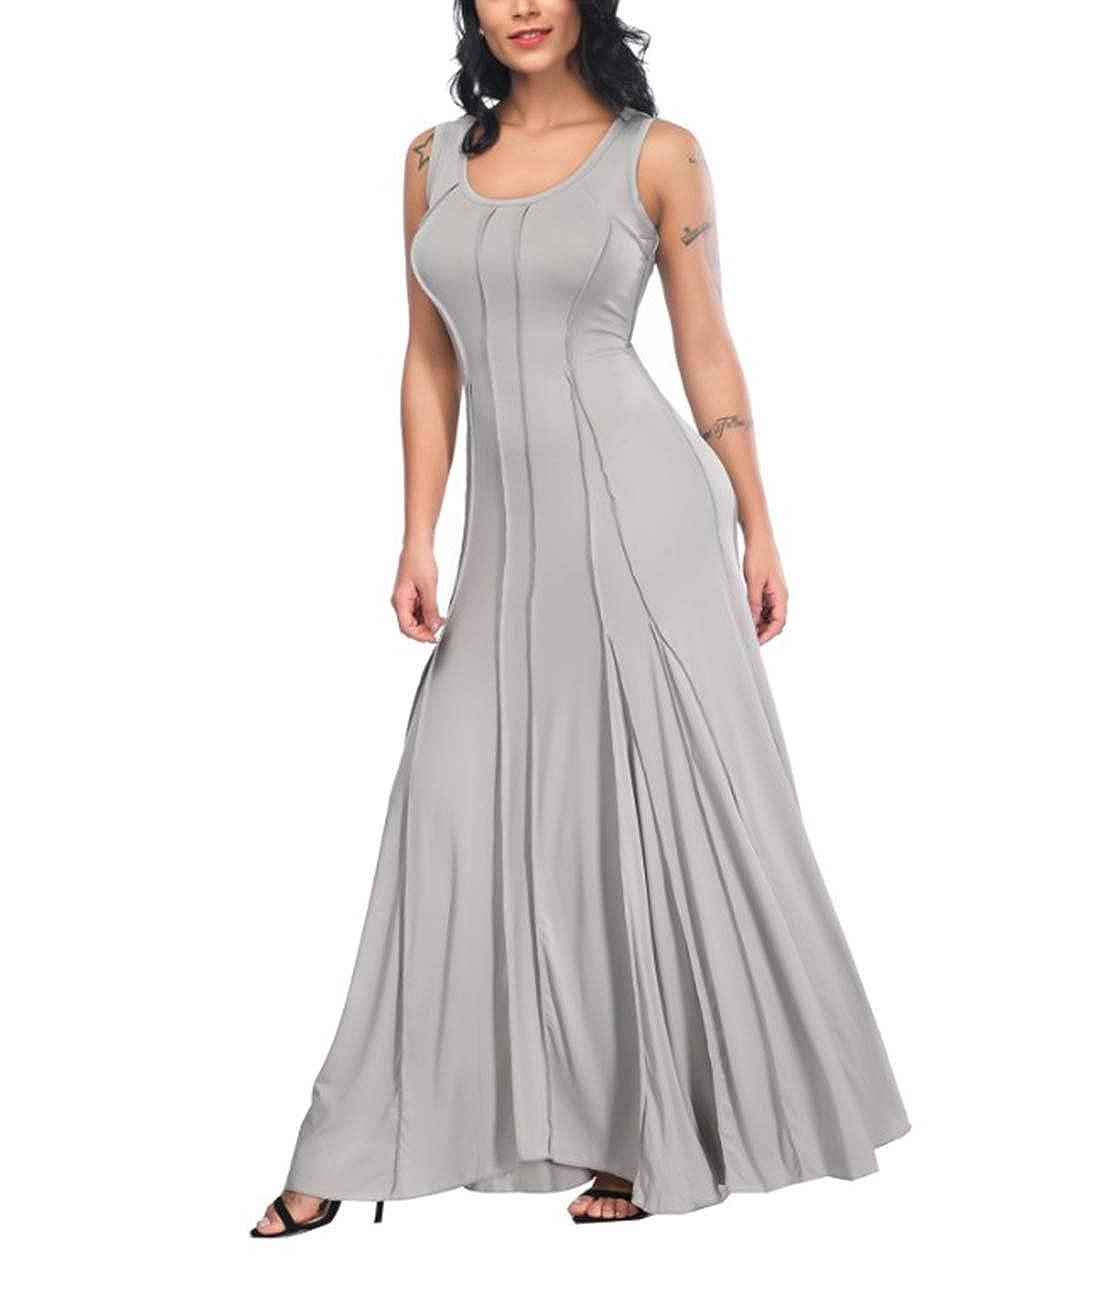 Plus Party Dresses CTARCROW Womens Sleeveless Crewneck Long Maxi Dress